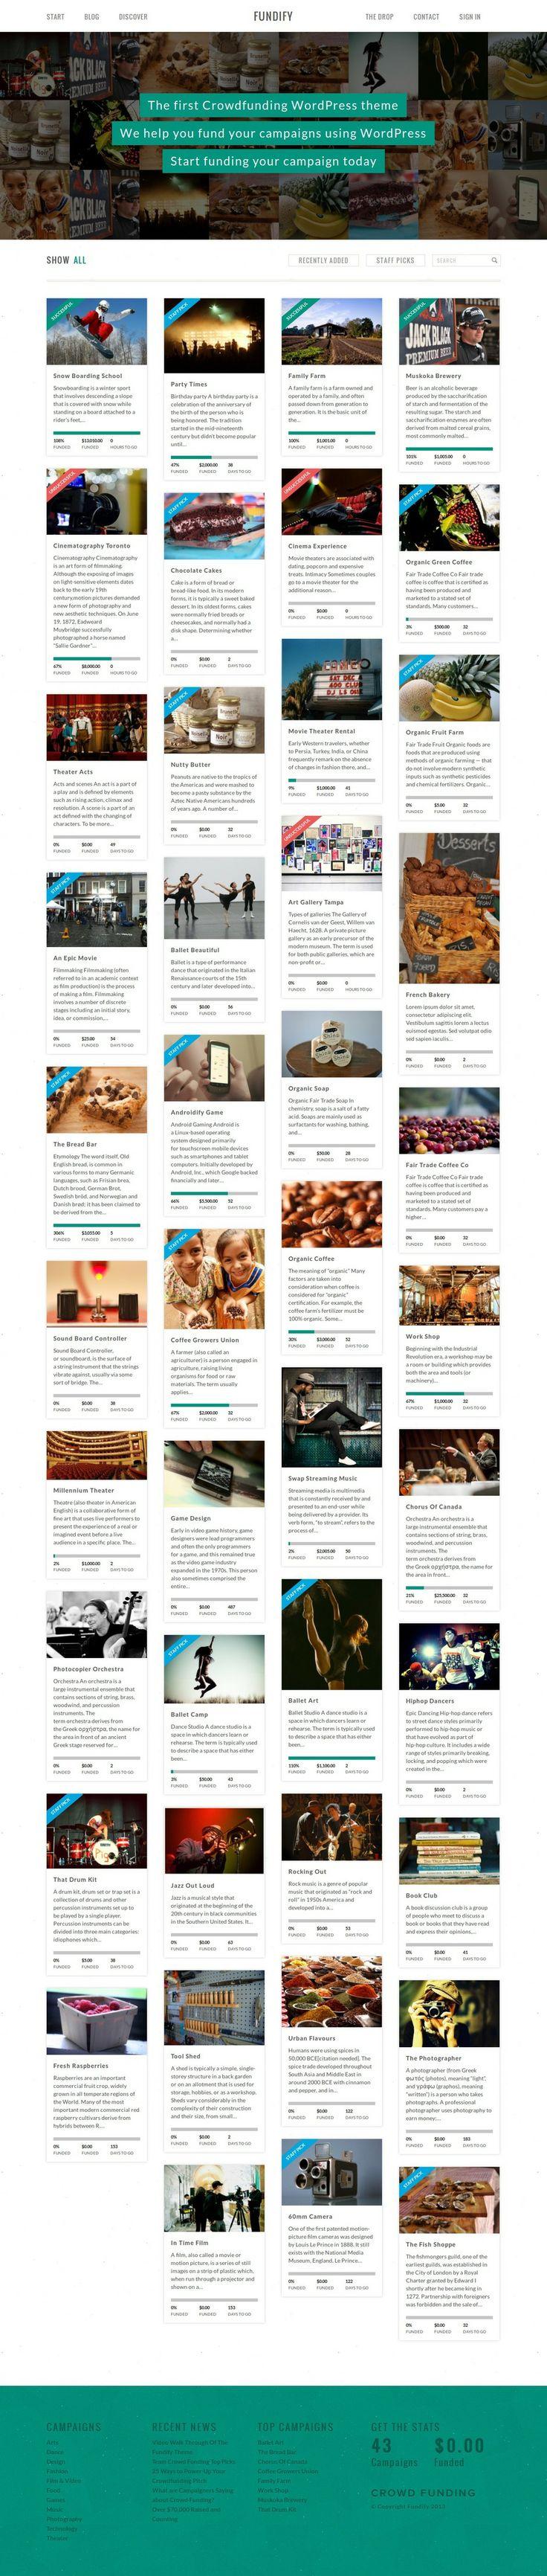 Best Pinterest Style Fancybox Wordpress Themes 2014